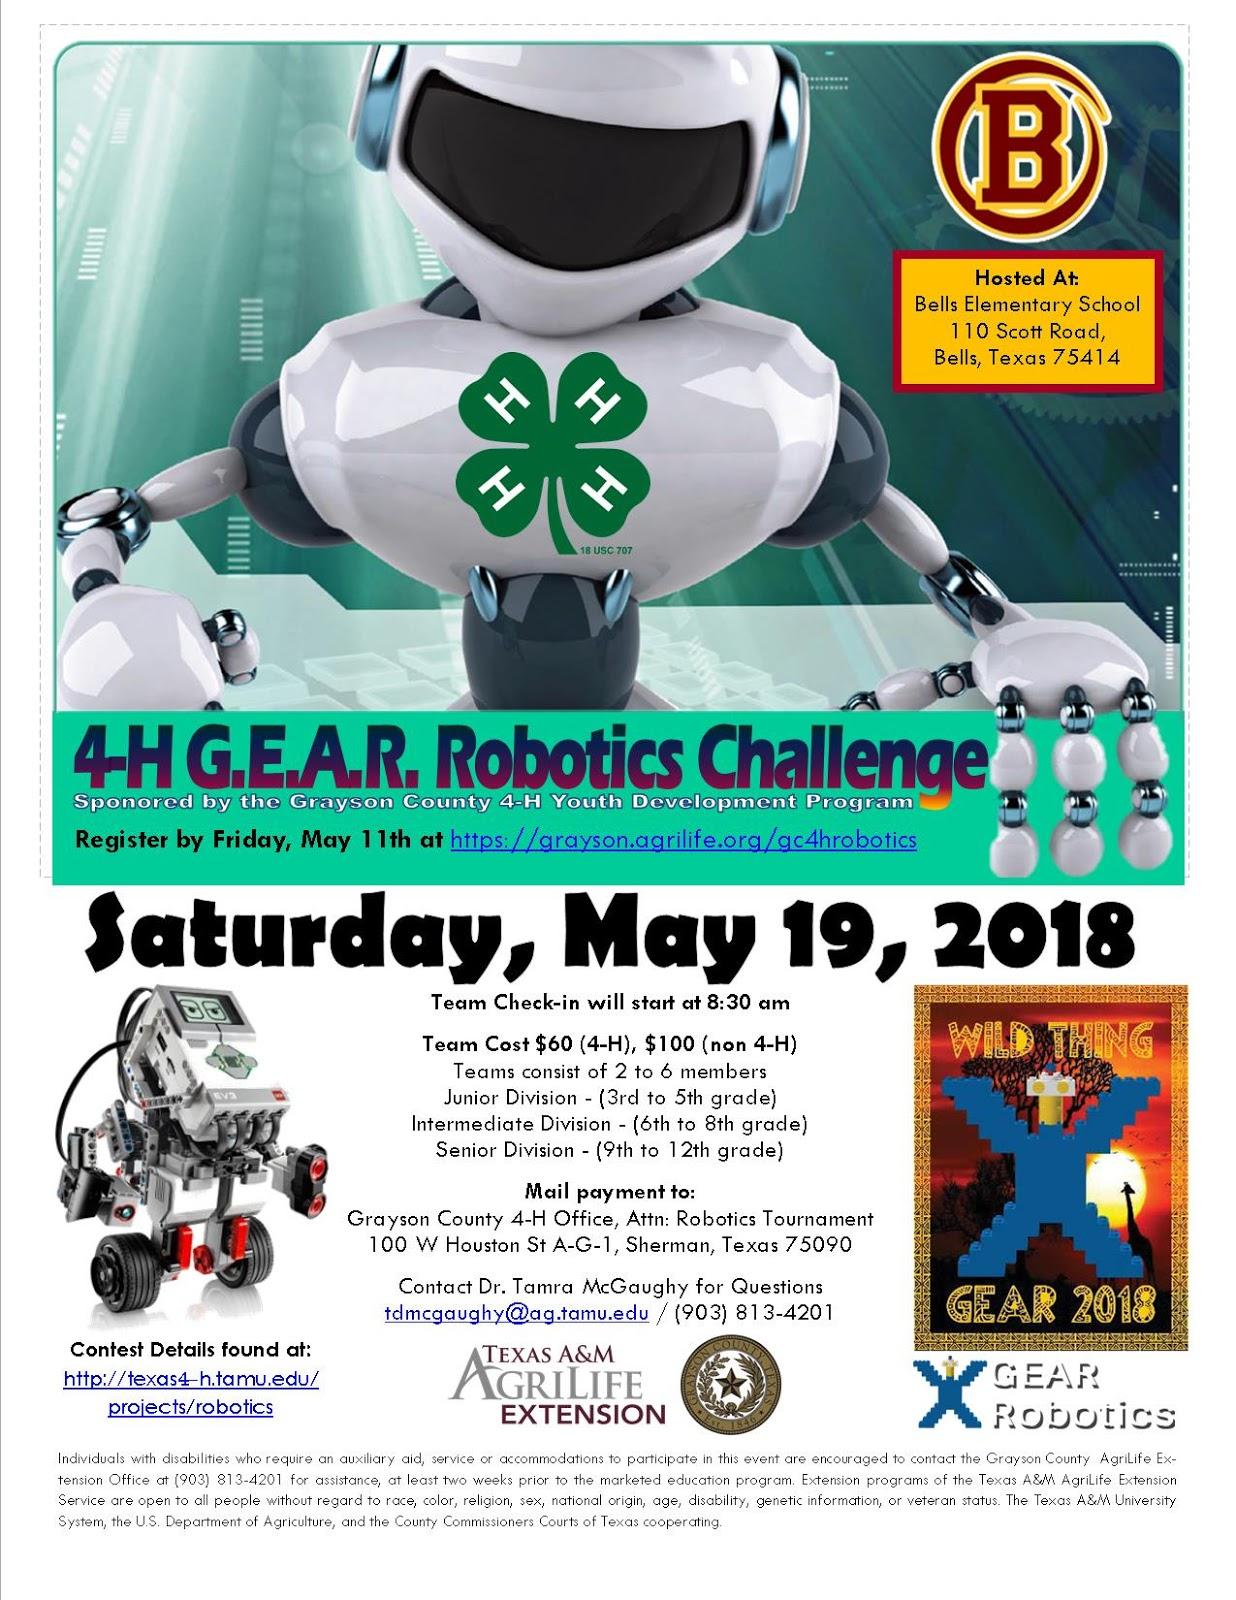 4-H GEAR Robotics Challenge DEADLINE